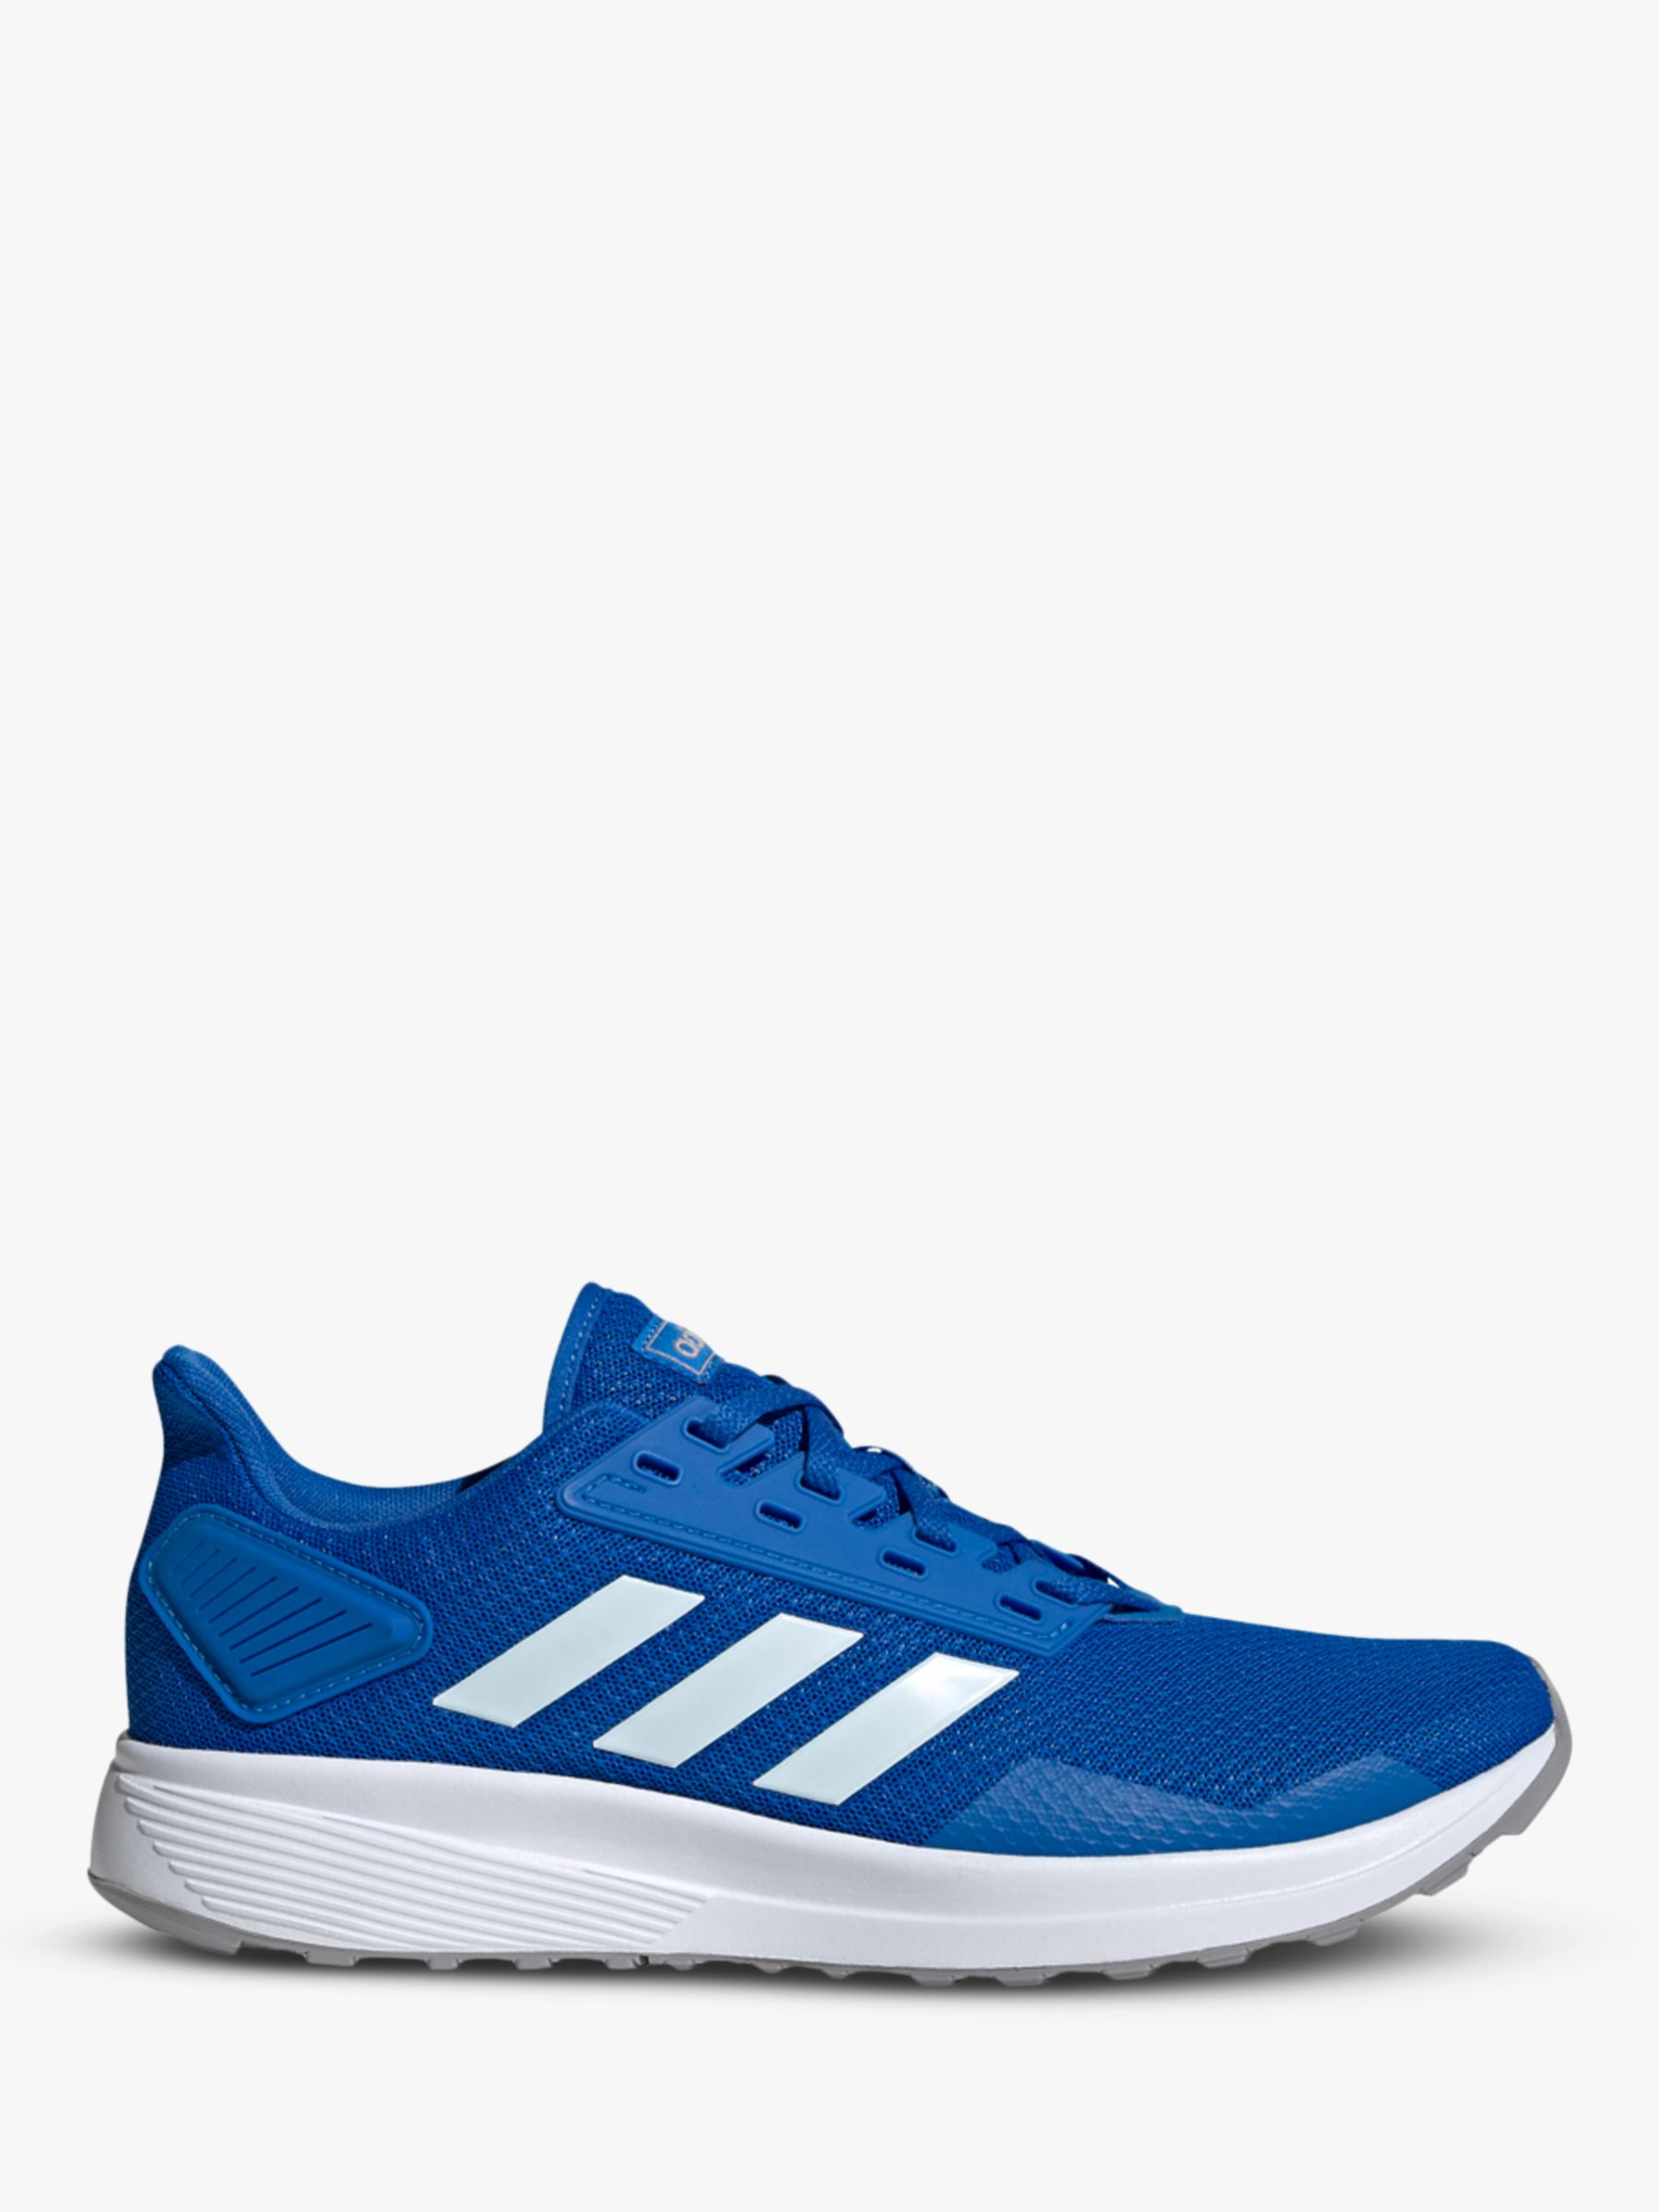 adidas Duramo 9 Men's Running Shoes at John Lewis & Partners